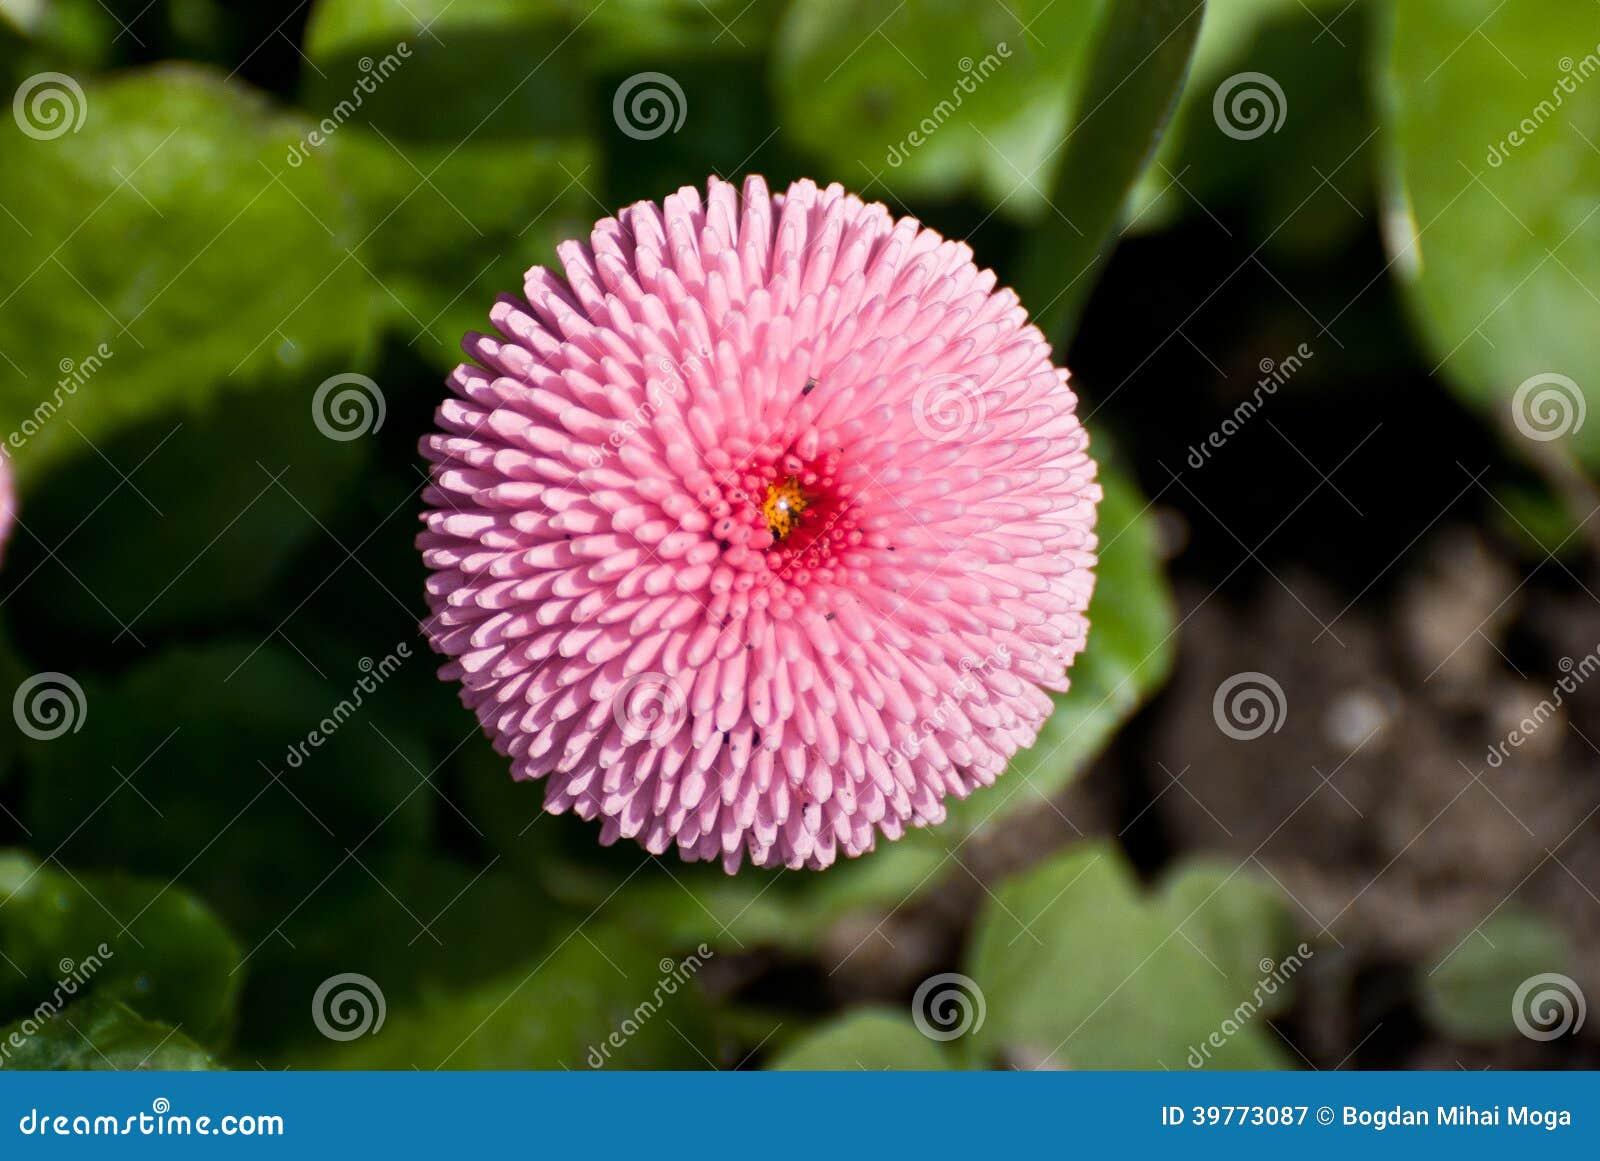 Pink round flower stock image image of garden pink 39773087 download pink round flower stock image image of garden pink 39773087 mightylinksfo